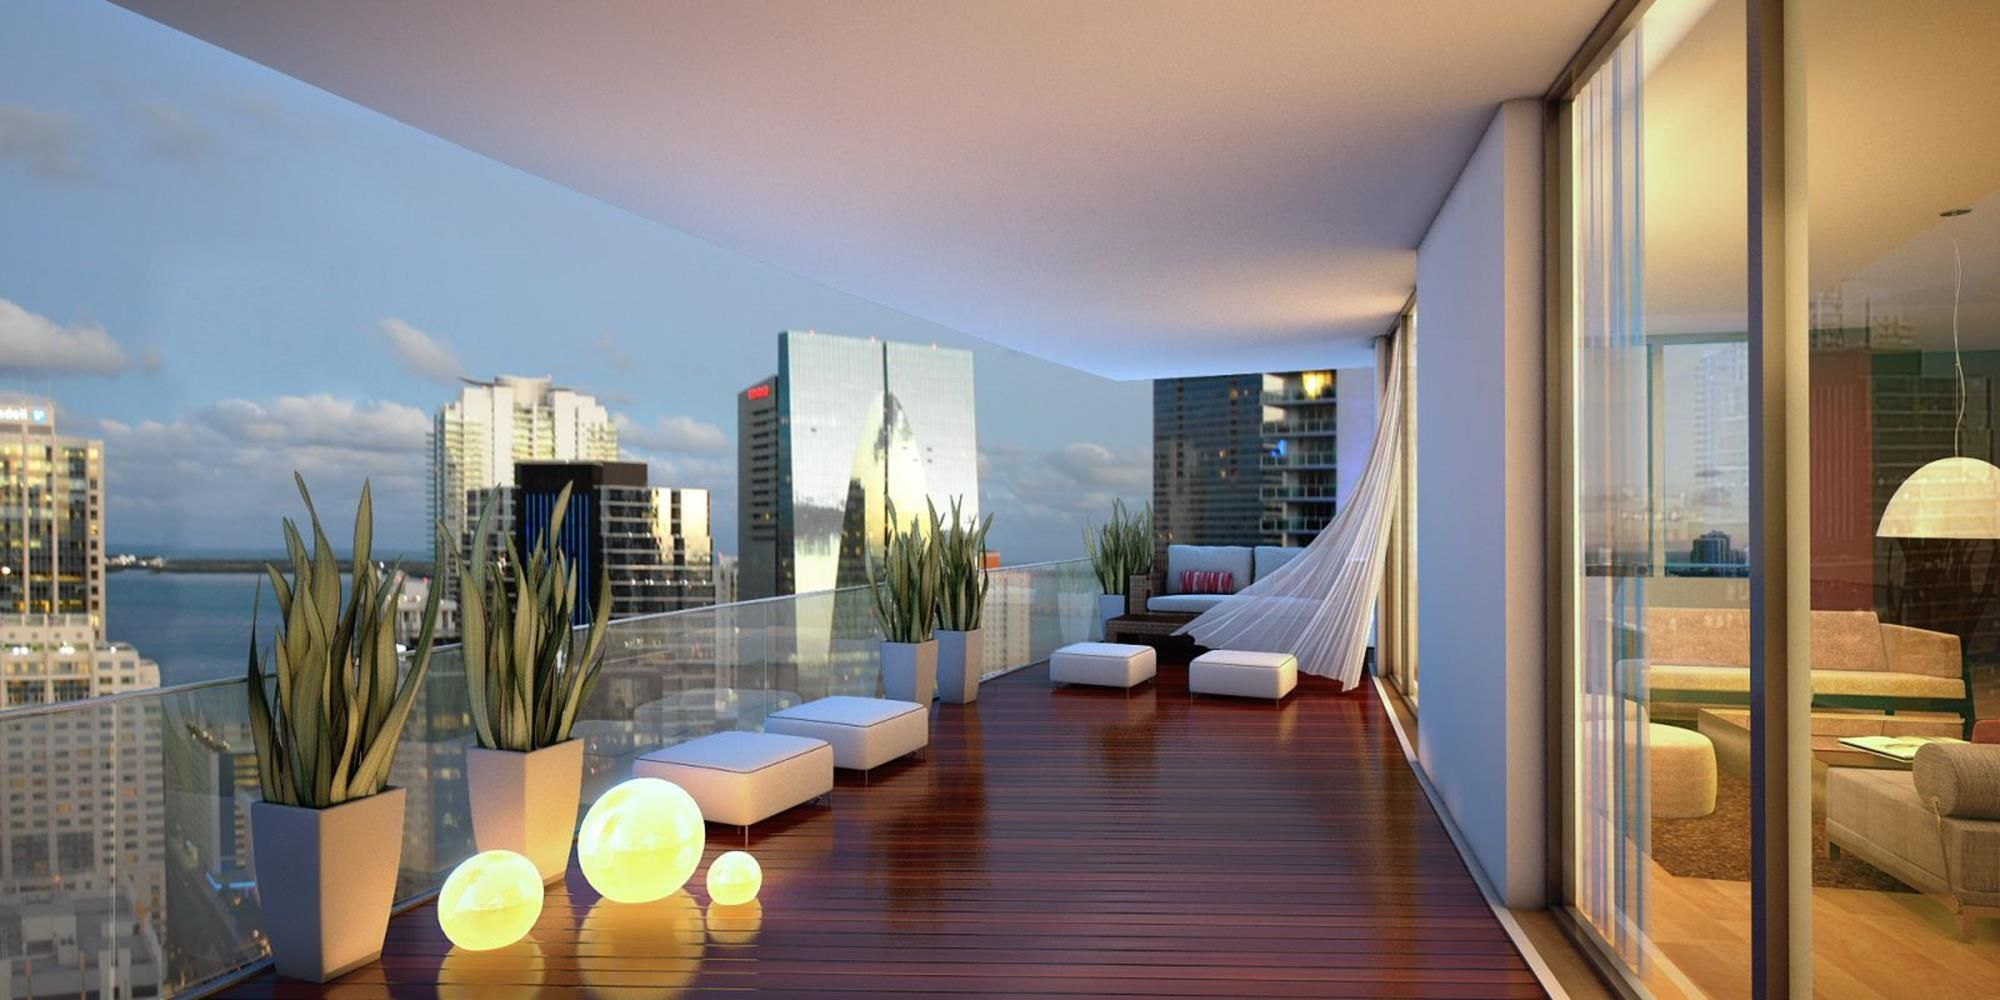 20 Stunning Luxury Beach Apartment Terrace Ideas Decorecord Balcony Decor Apartment Terrace Balcony Design